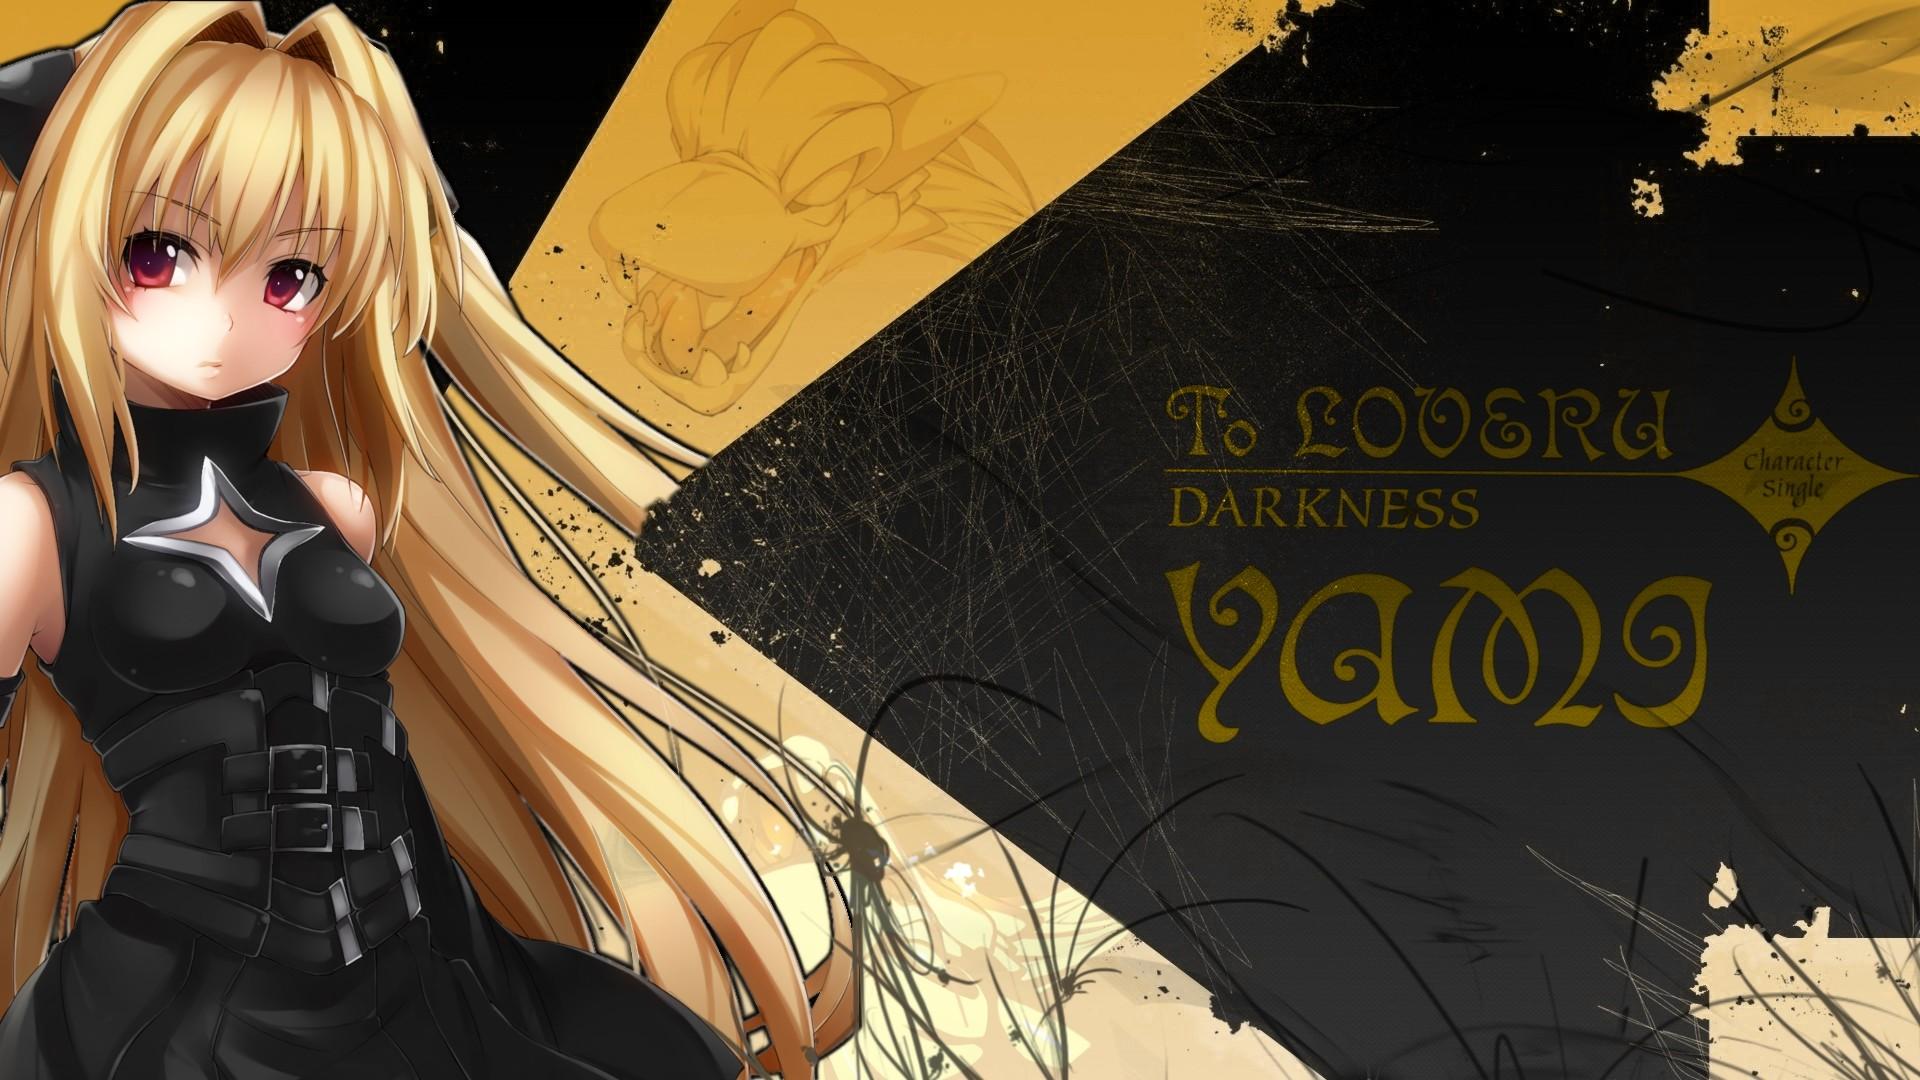 Yami Golden Darkness Wallpaper 54 Images